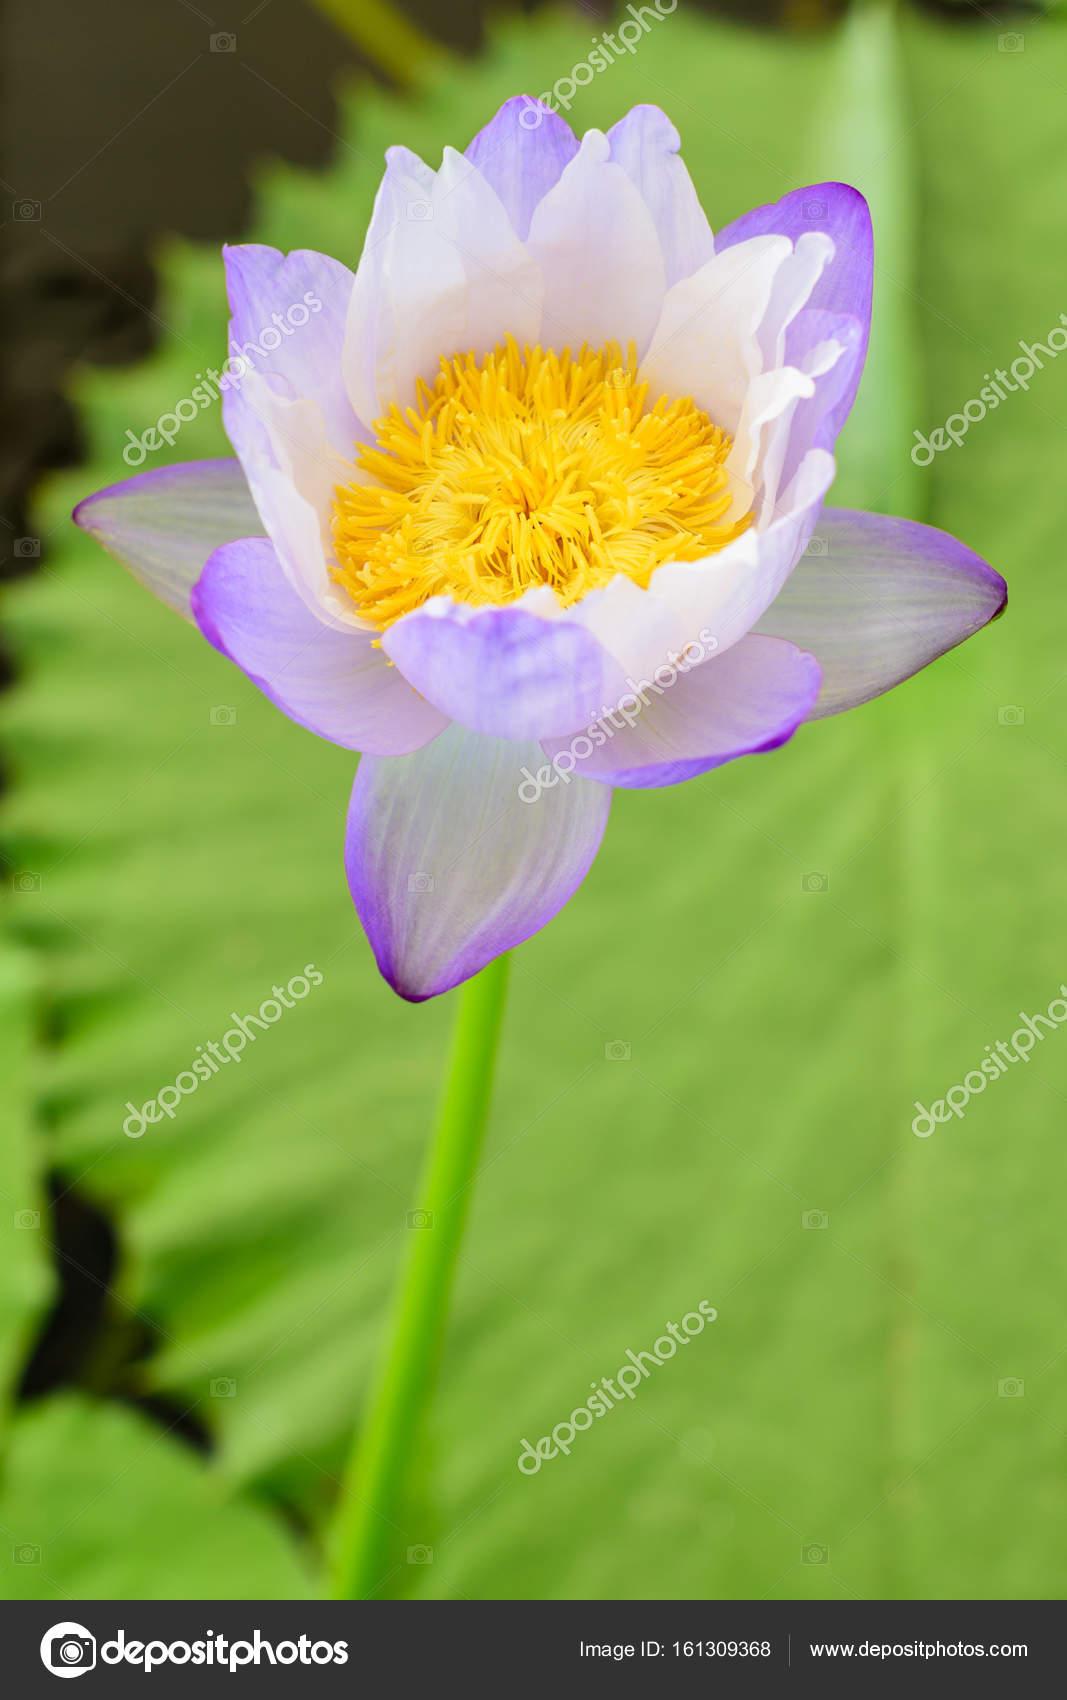 Nice blooming lotus flower stock photo pixbox77 161309368 nice blooming lotus flower stock photo izmirmasajfo